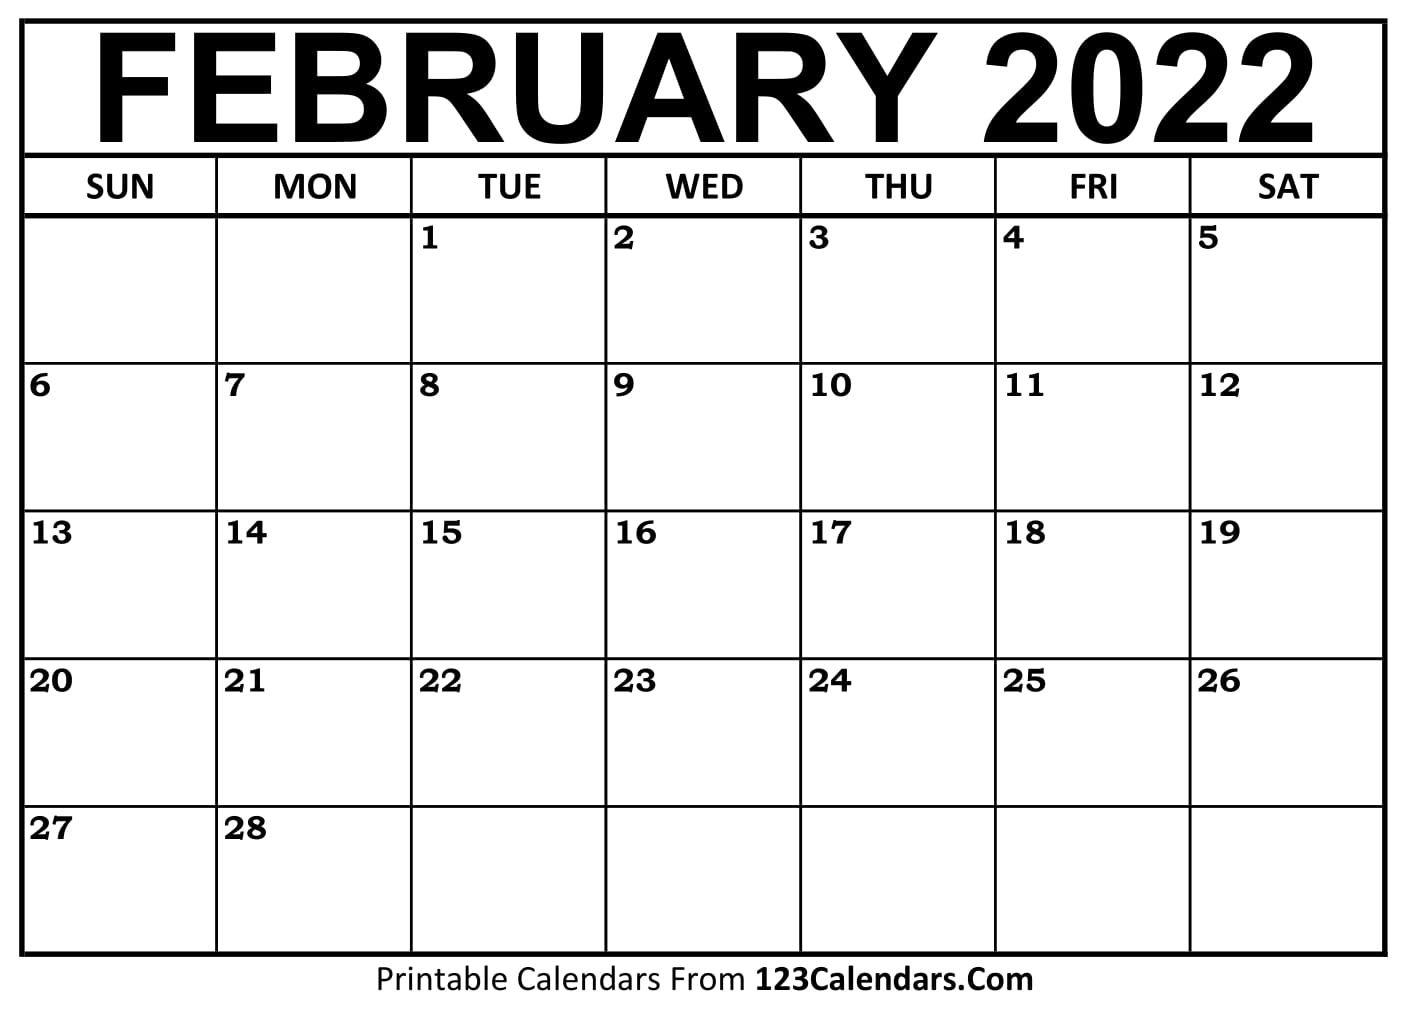 Printable February 2021 Calendar Templates   123Calendars